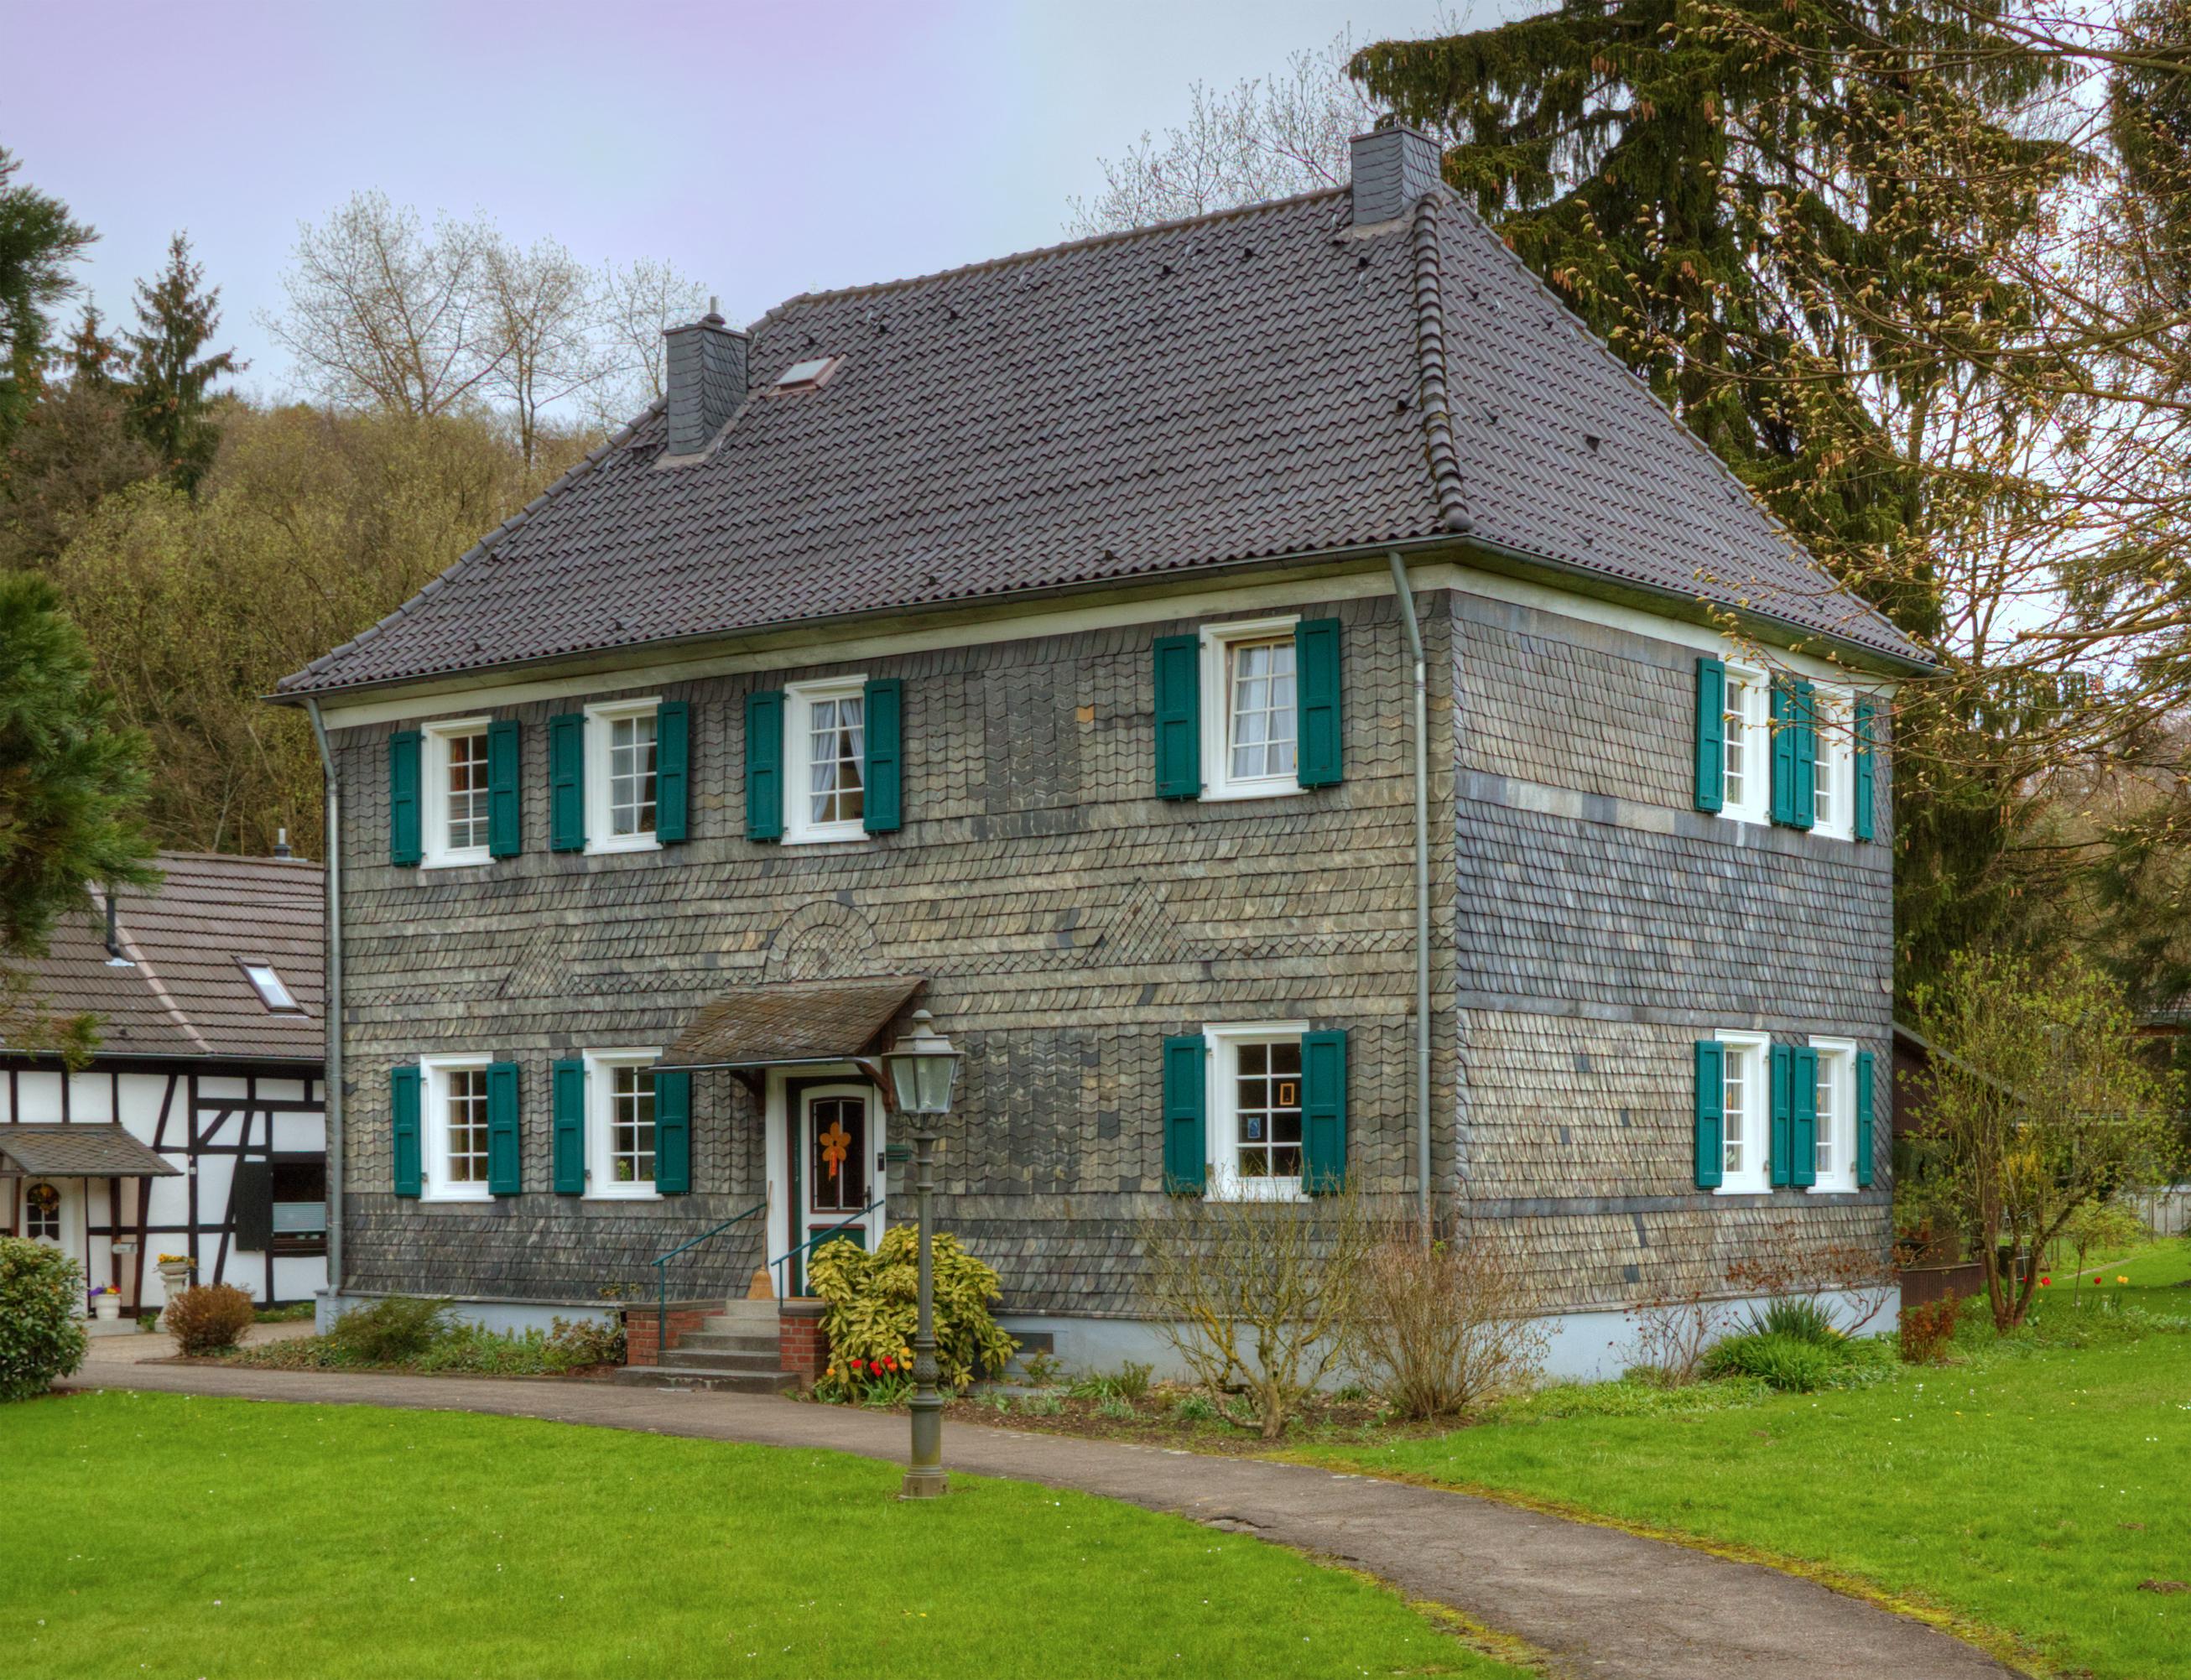 Haus – Wikipedia